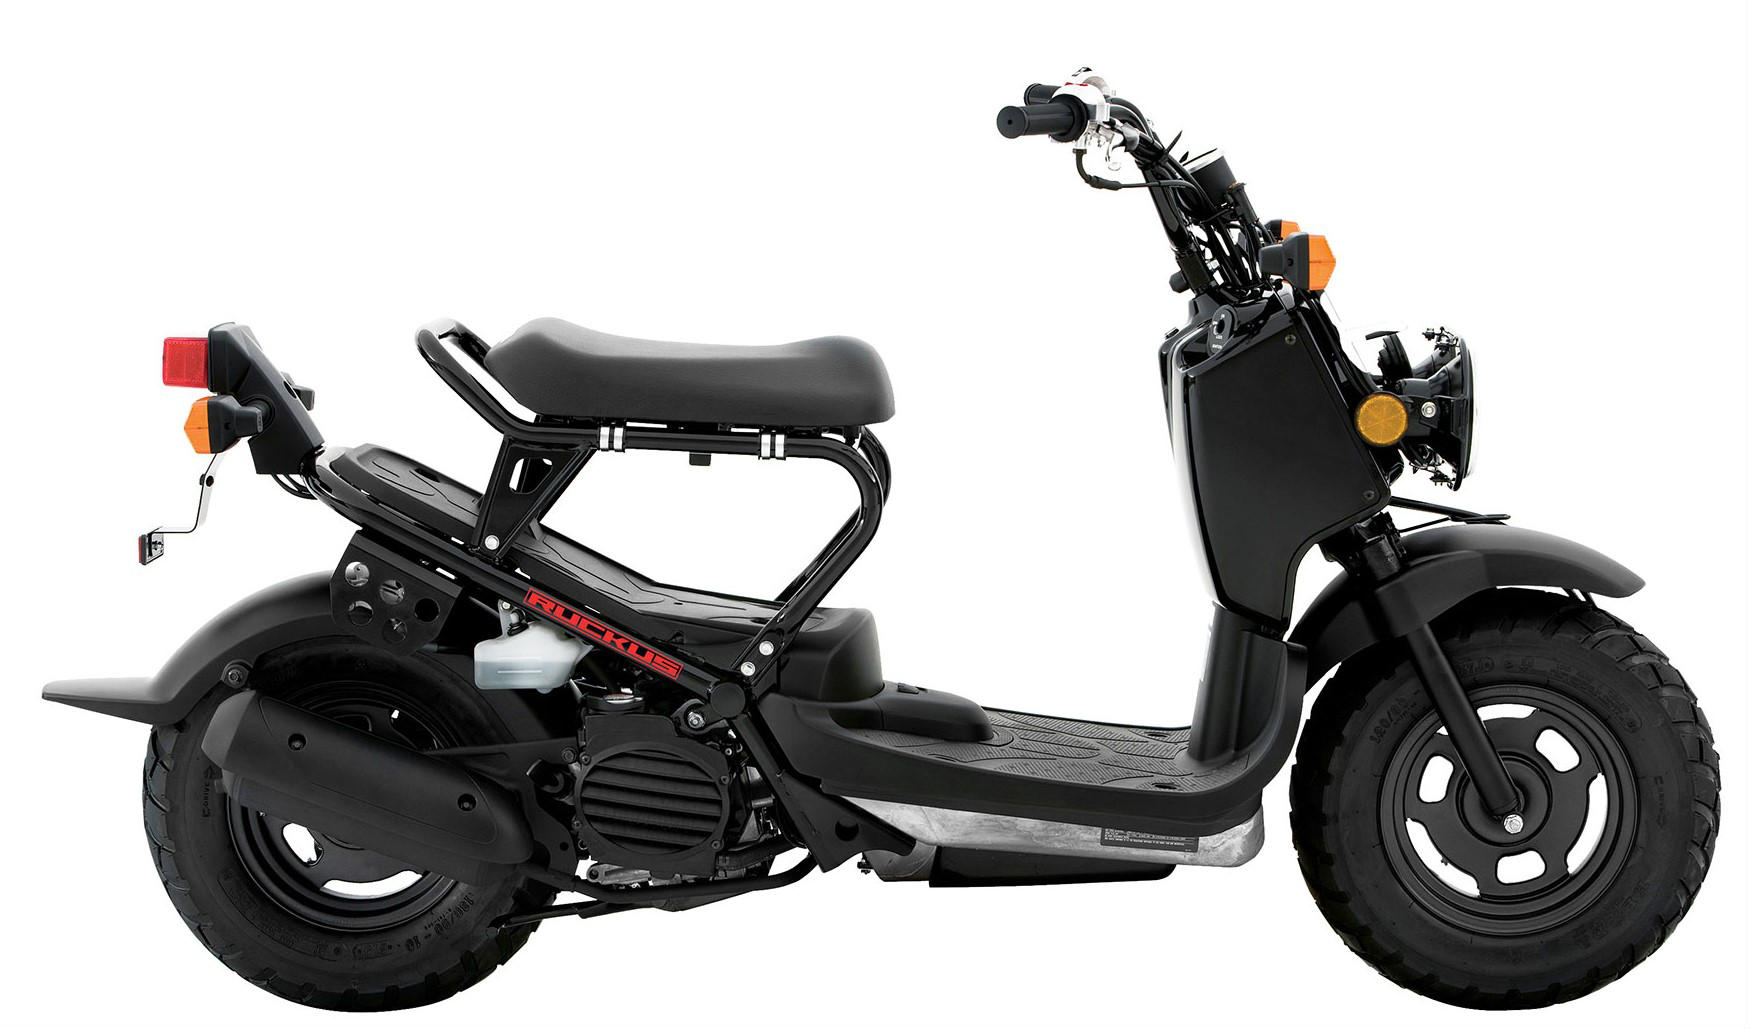 New 2016 Honda Motorcycle Announcement | Model Lineup ...